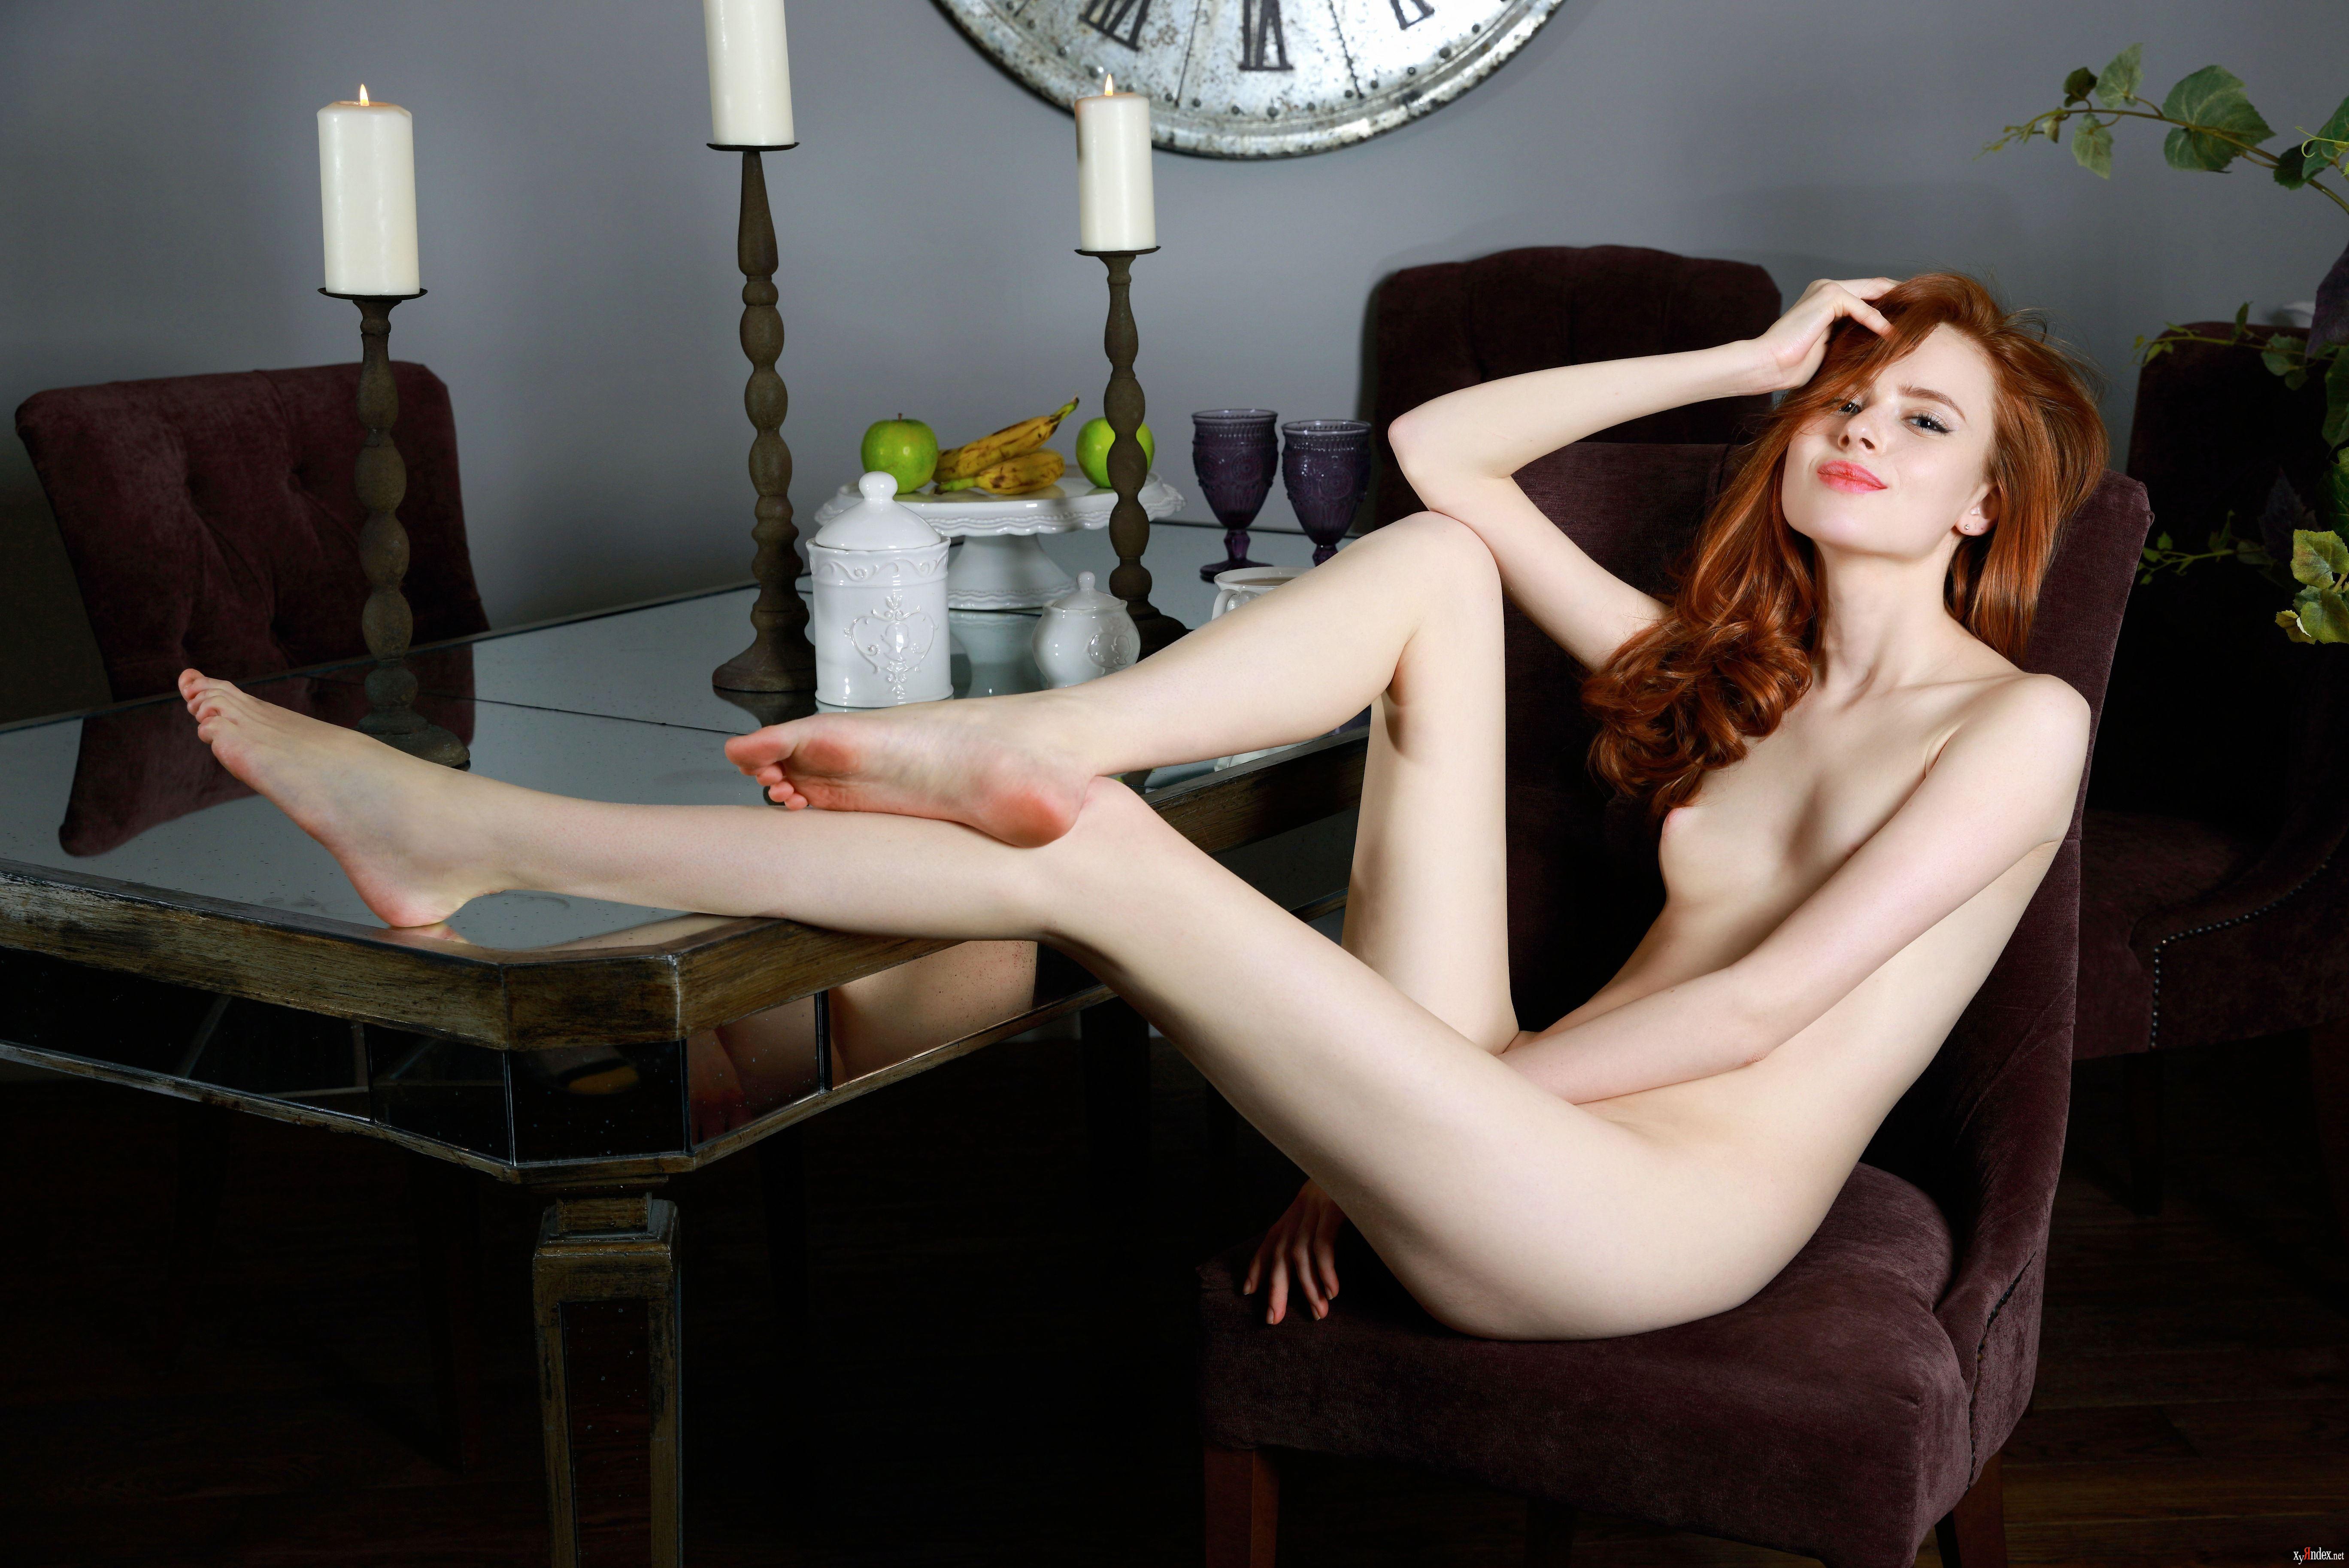 skinny-redhead-long-legs-nude-amatureporn-free